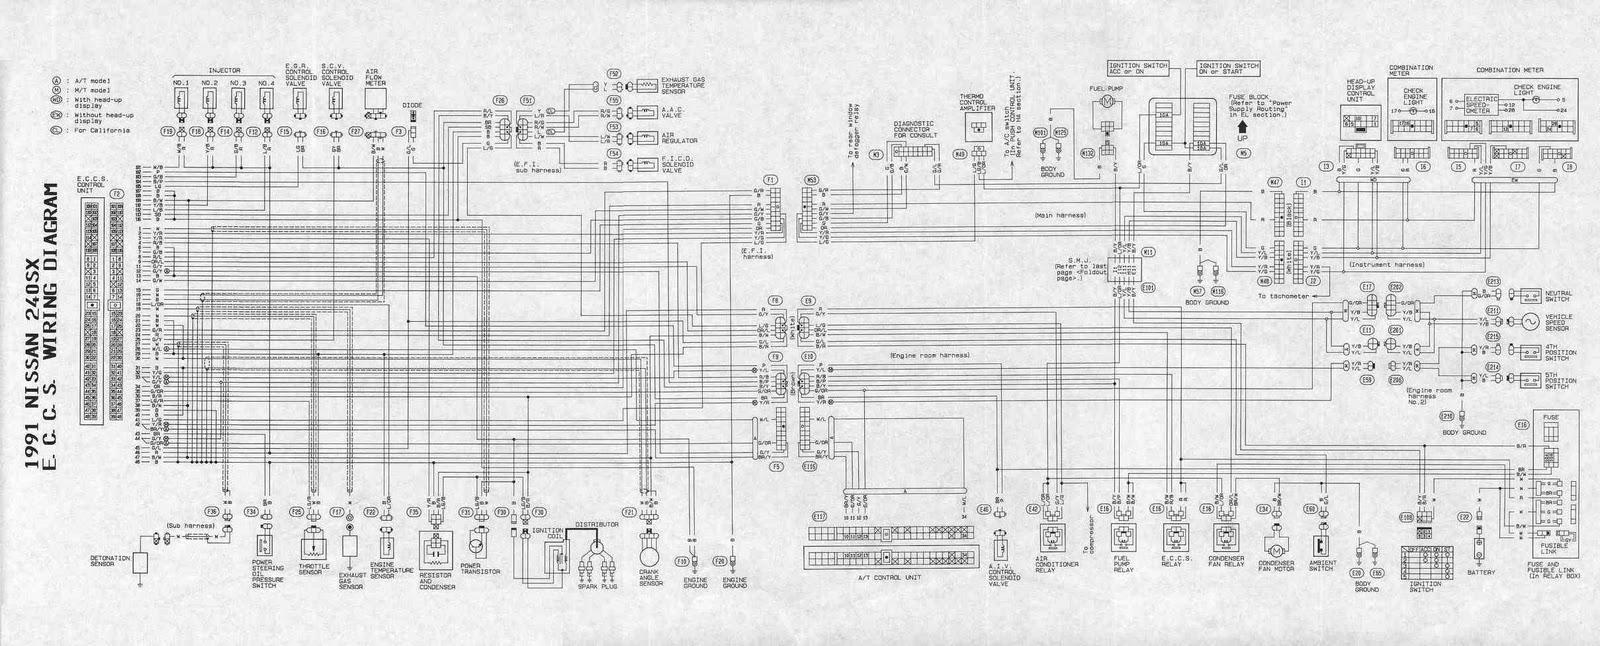 Marvelous 1994 Nissan 240Sx Wiring Diagram Wiring Diagram Data Schema Wiring Cloud Hisonuggs Outletorg